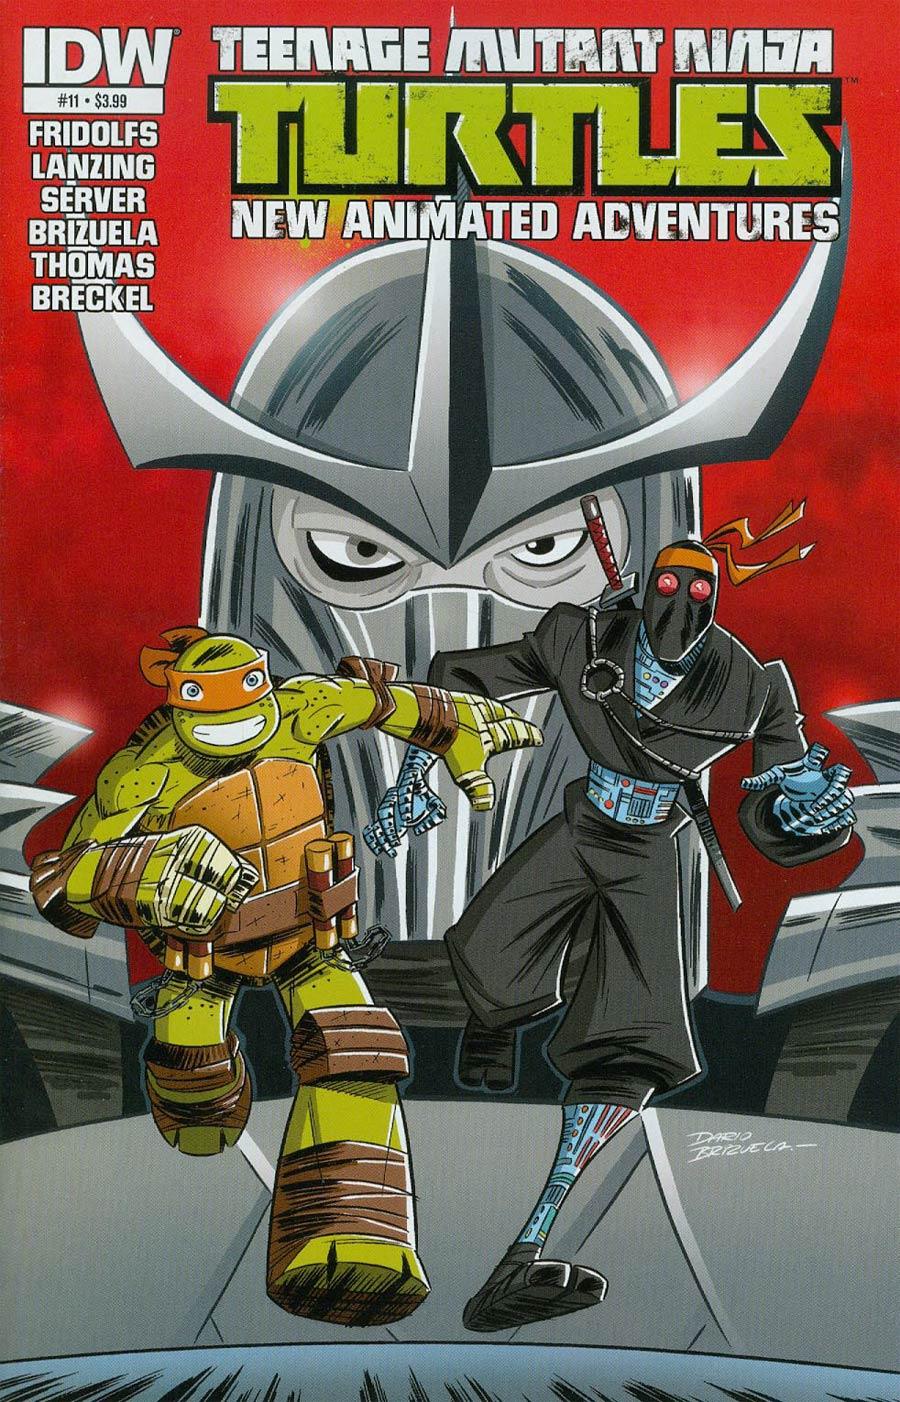 Teenage Mutant Ninja Turtles New Animated Adventures #11 Cover A Regular Dario Brizuela Cover